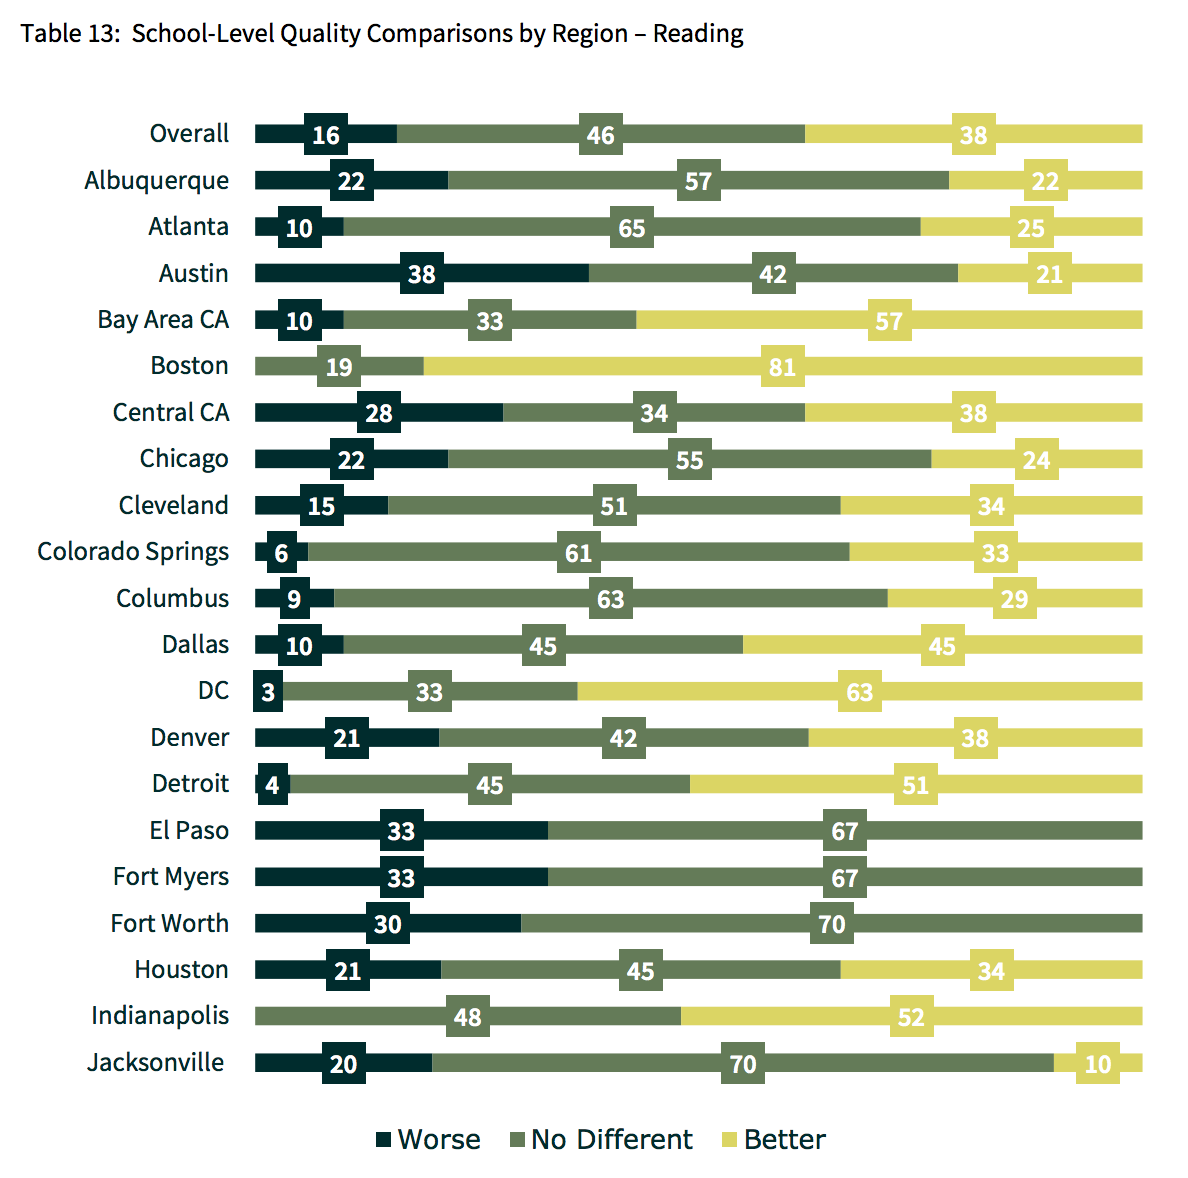 2015 CREDO Charter School Study: Comparison of School-Level Quality, Reading